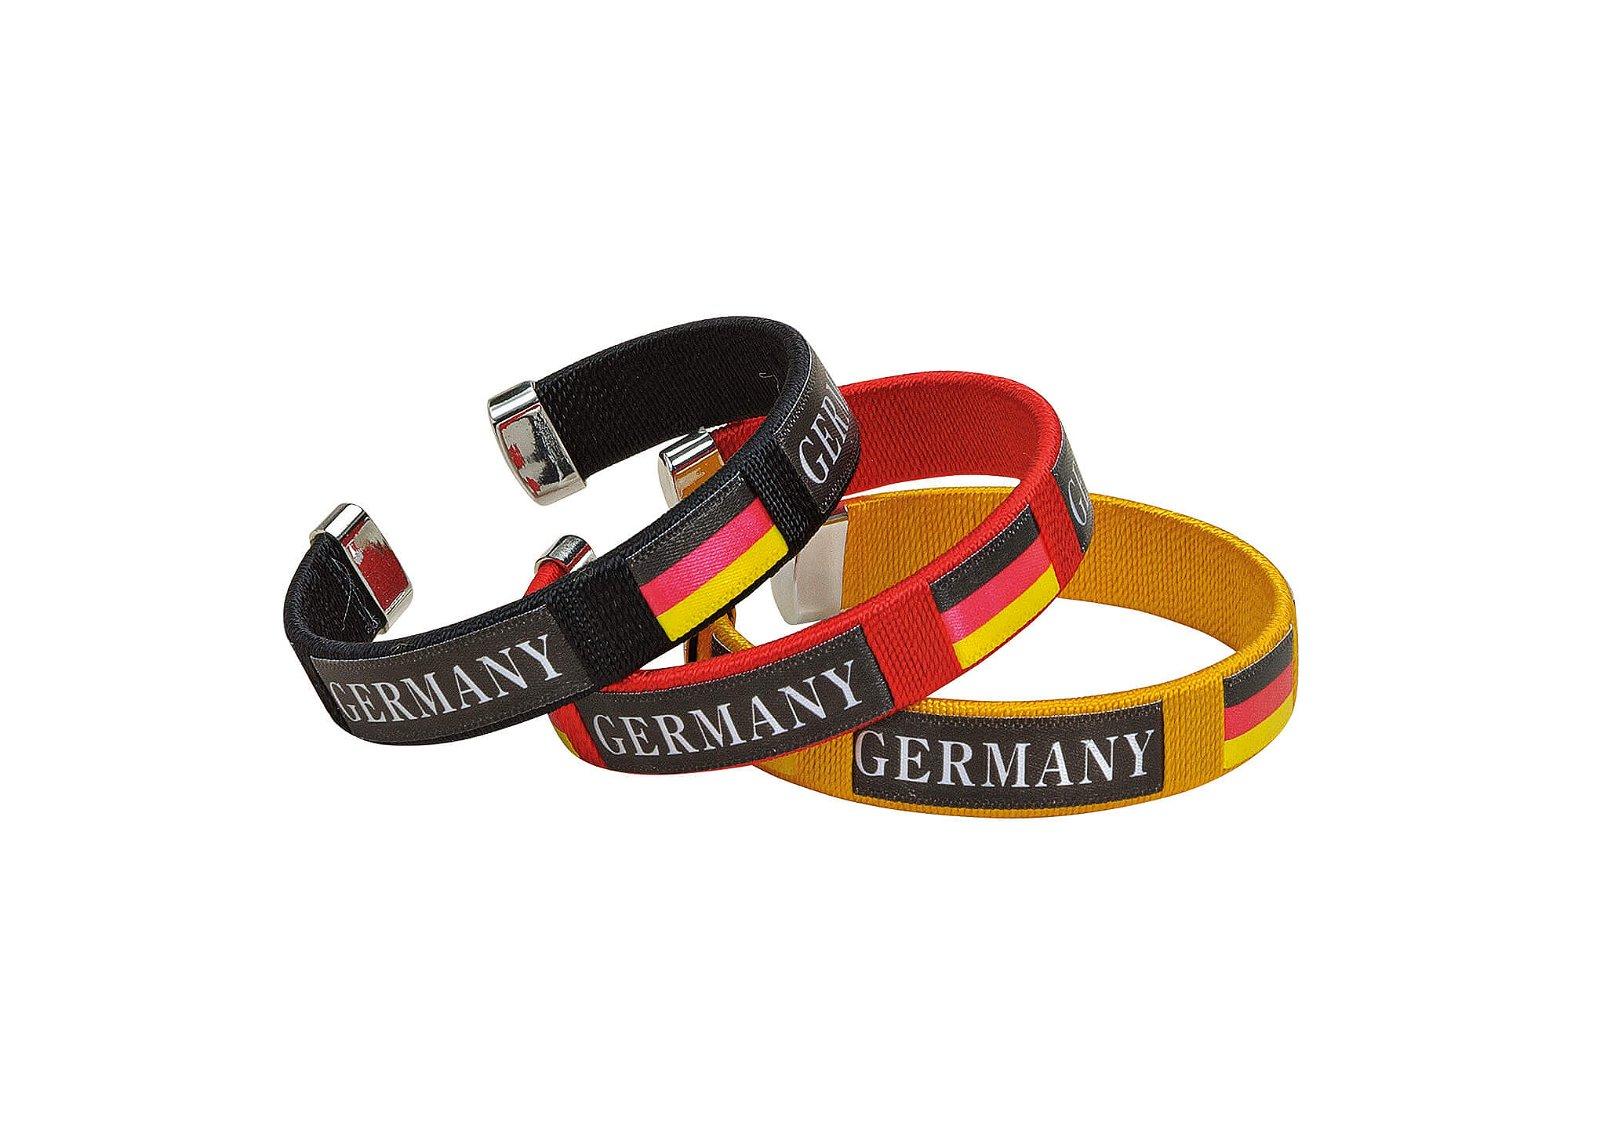 Bracelet germany polyester set black/yellow/red